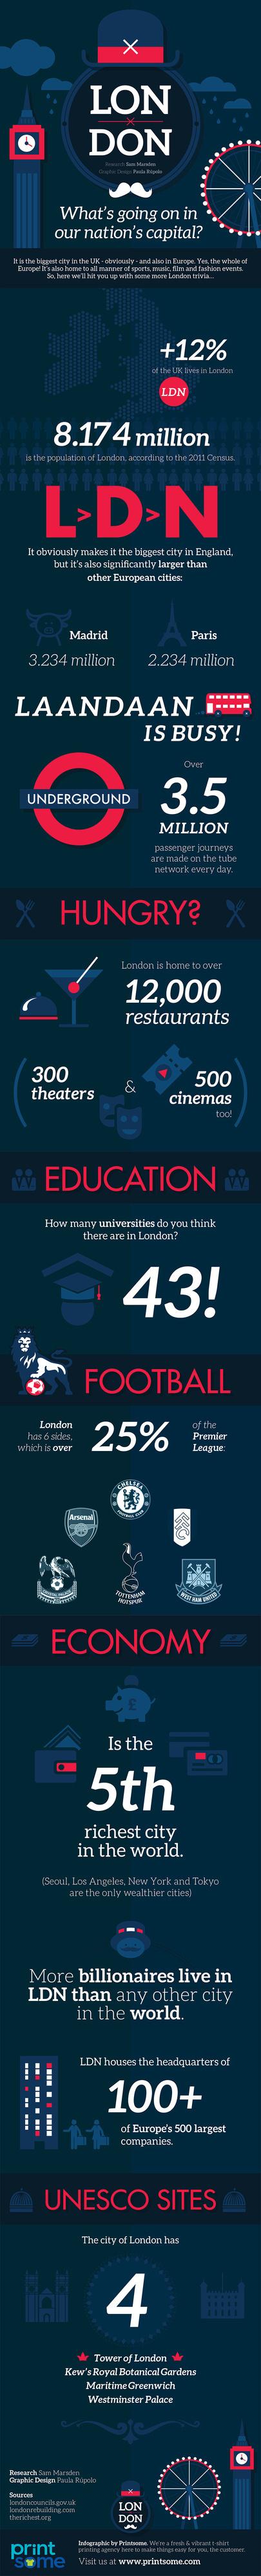 London Infographic #london #infographic